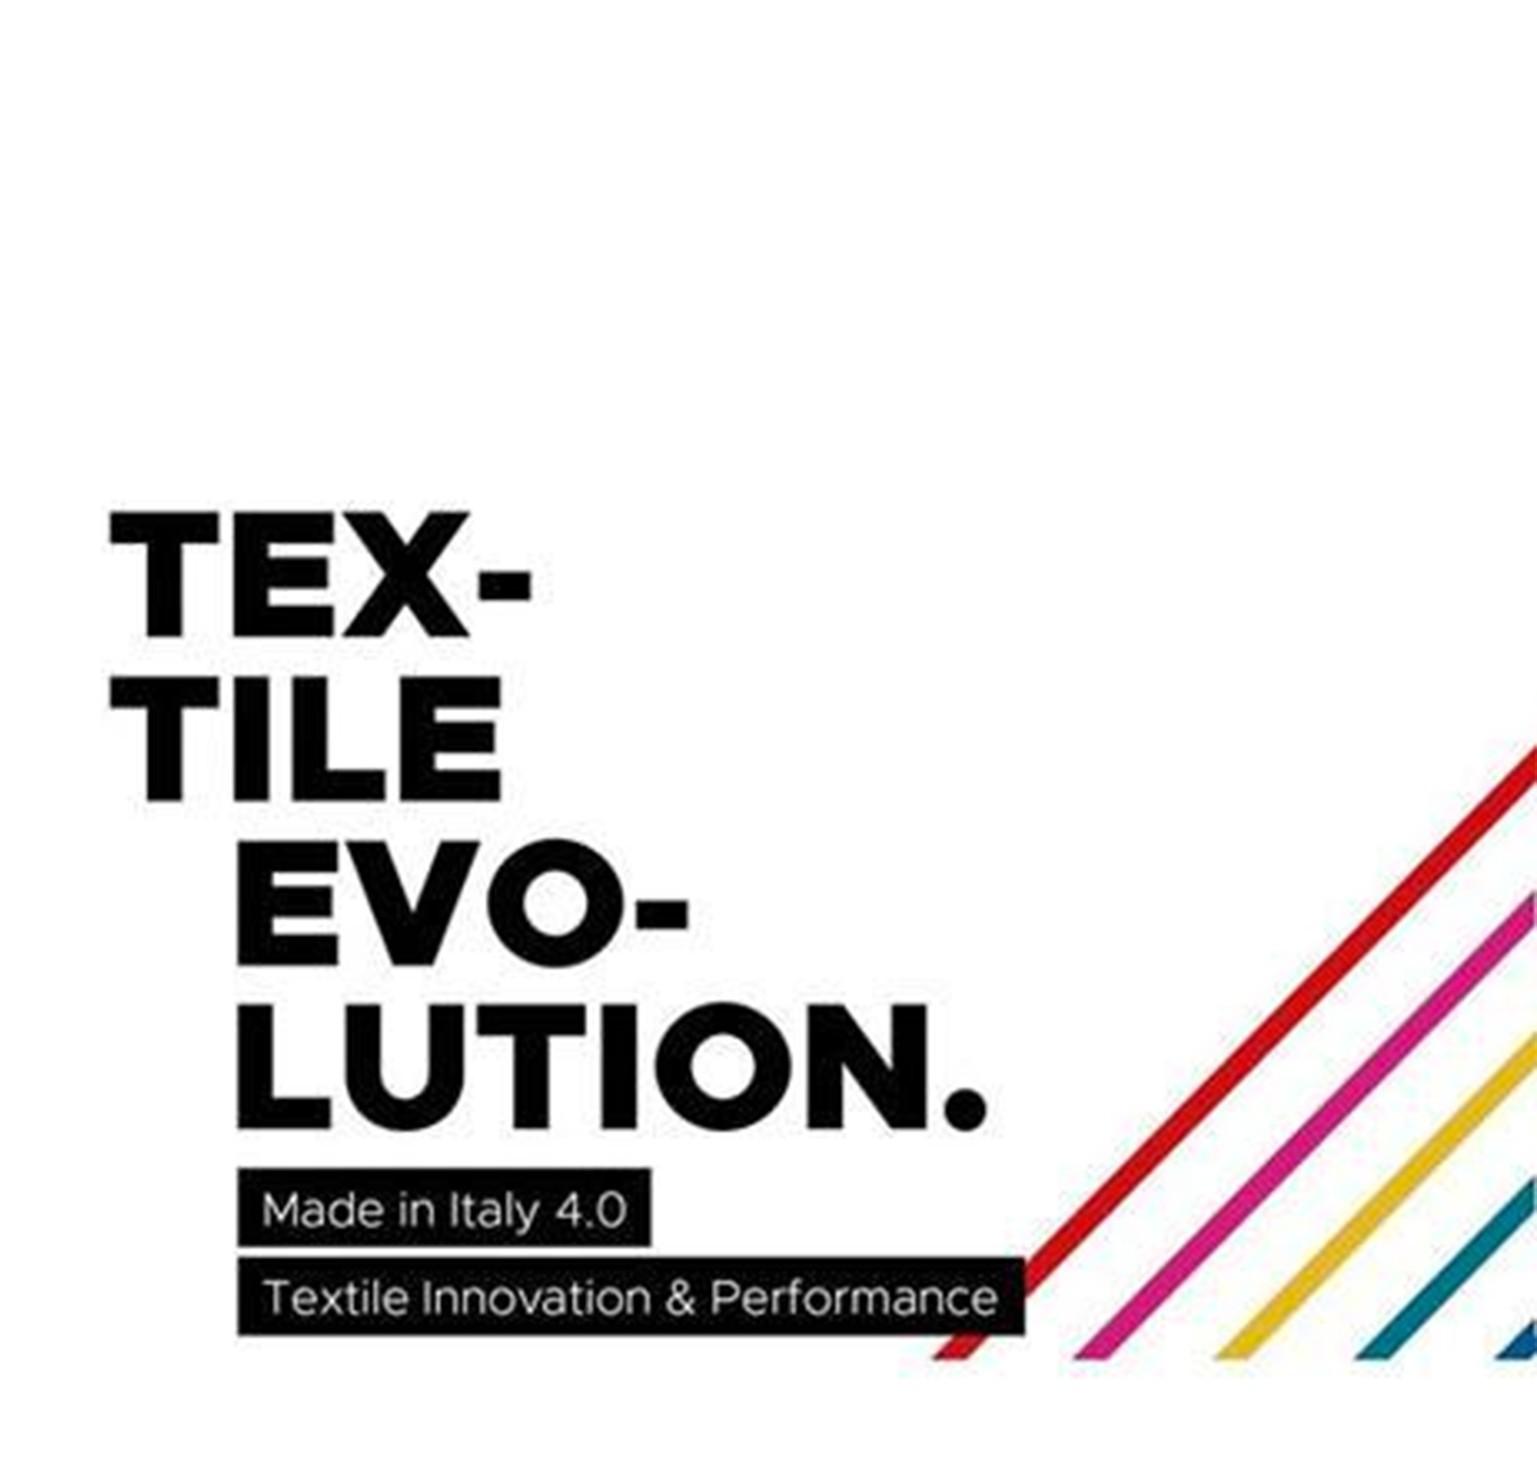 Textile_evolution